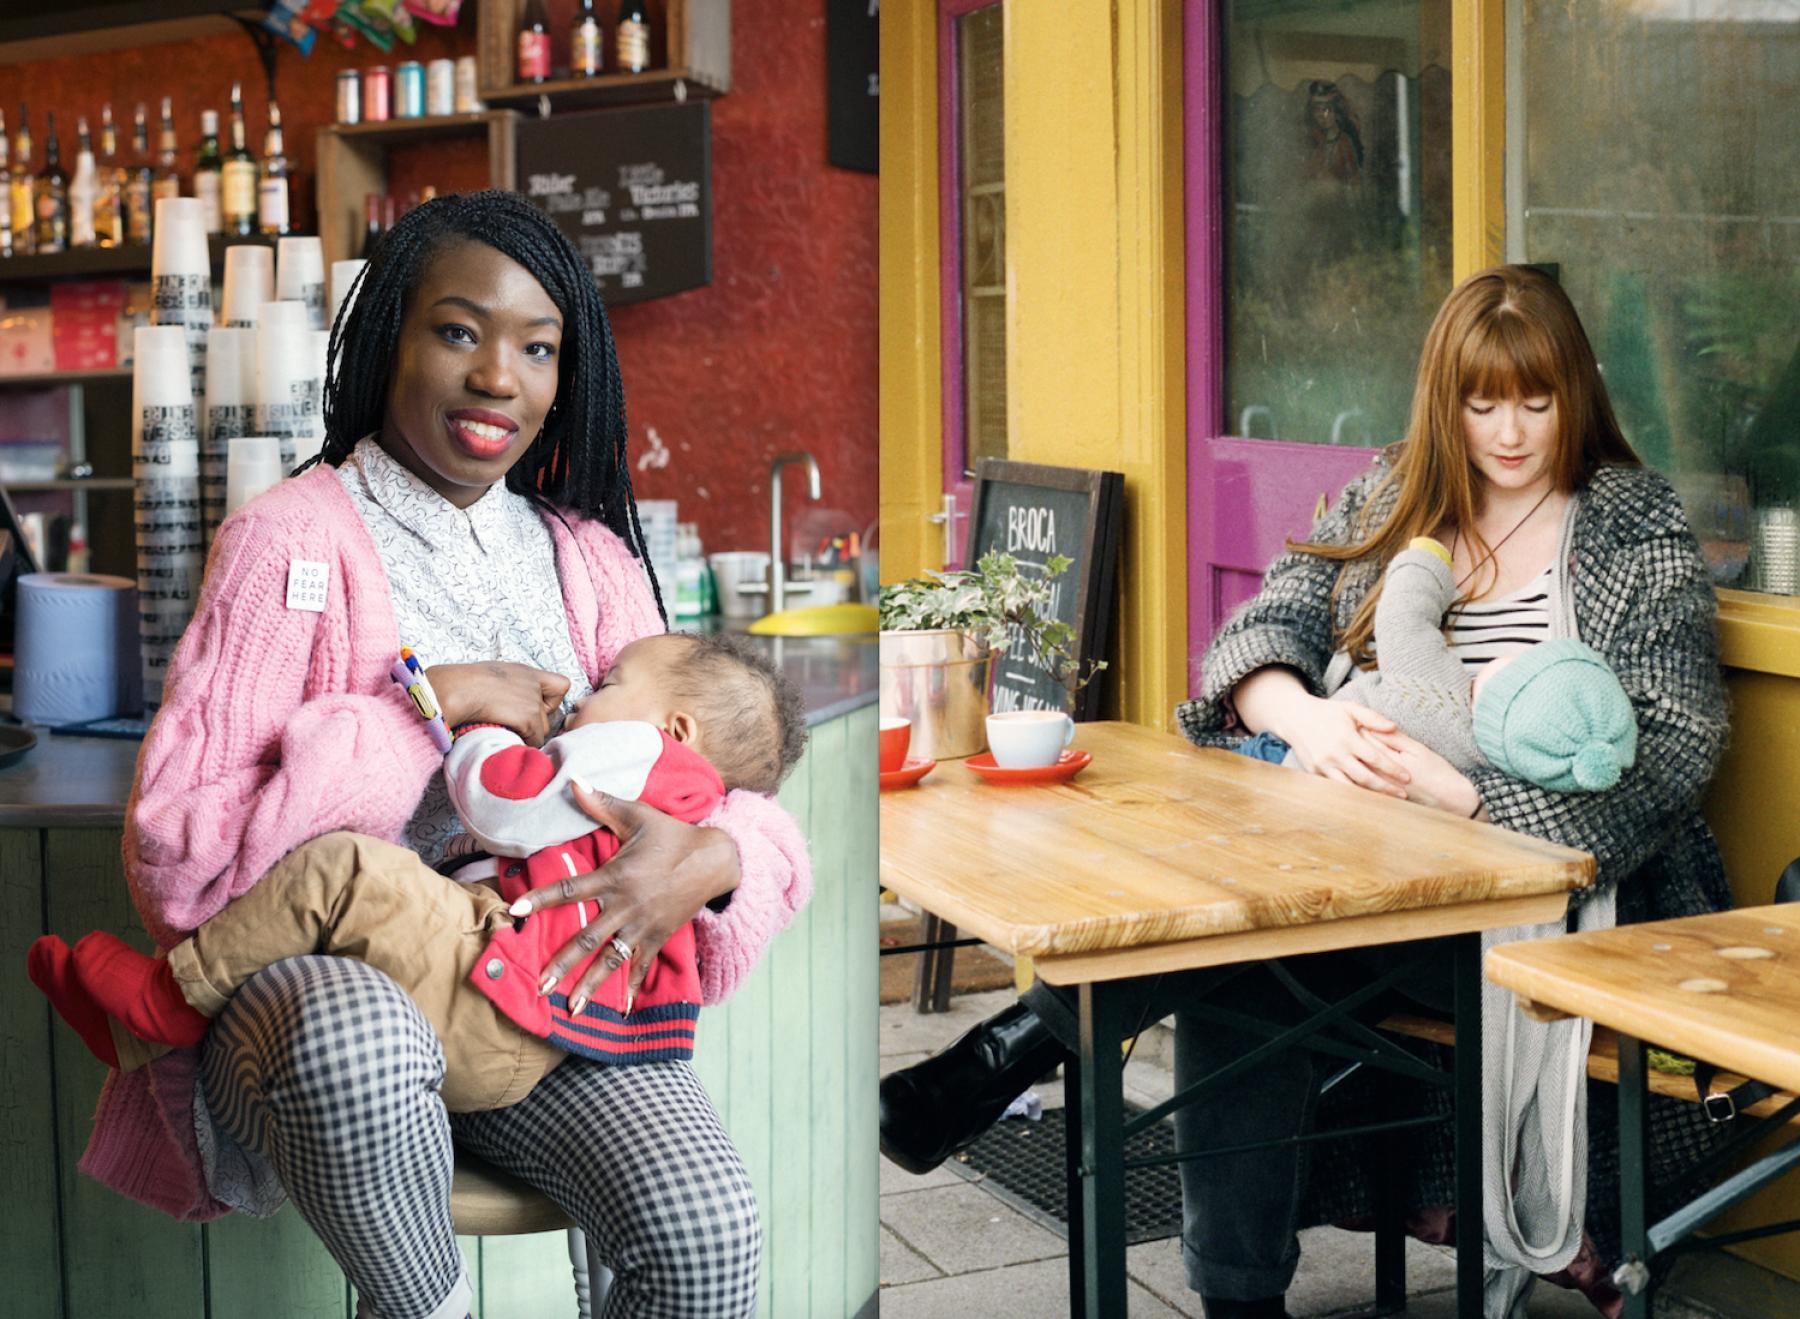 photo series challenges breastfeeding taboo positive news